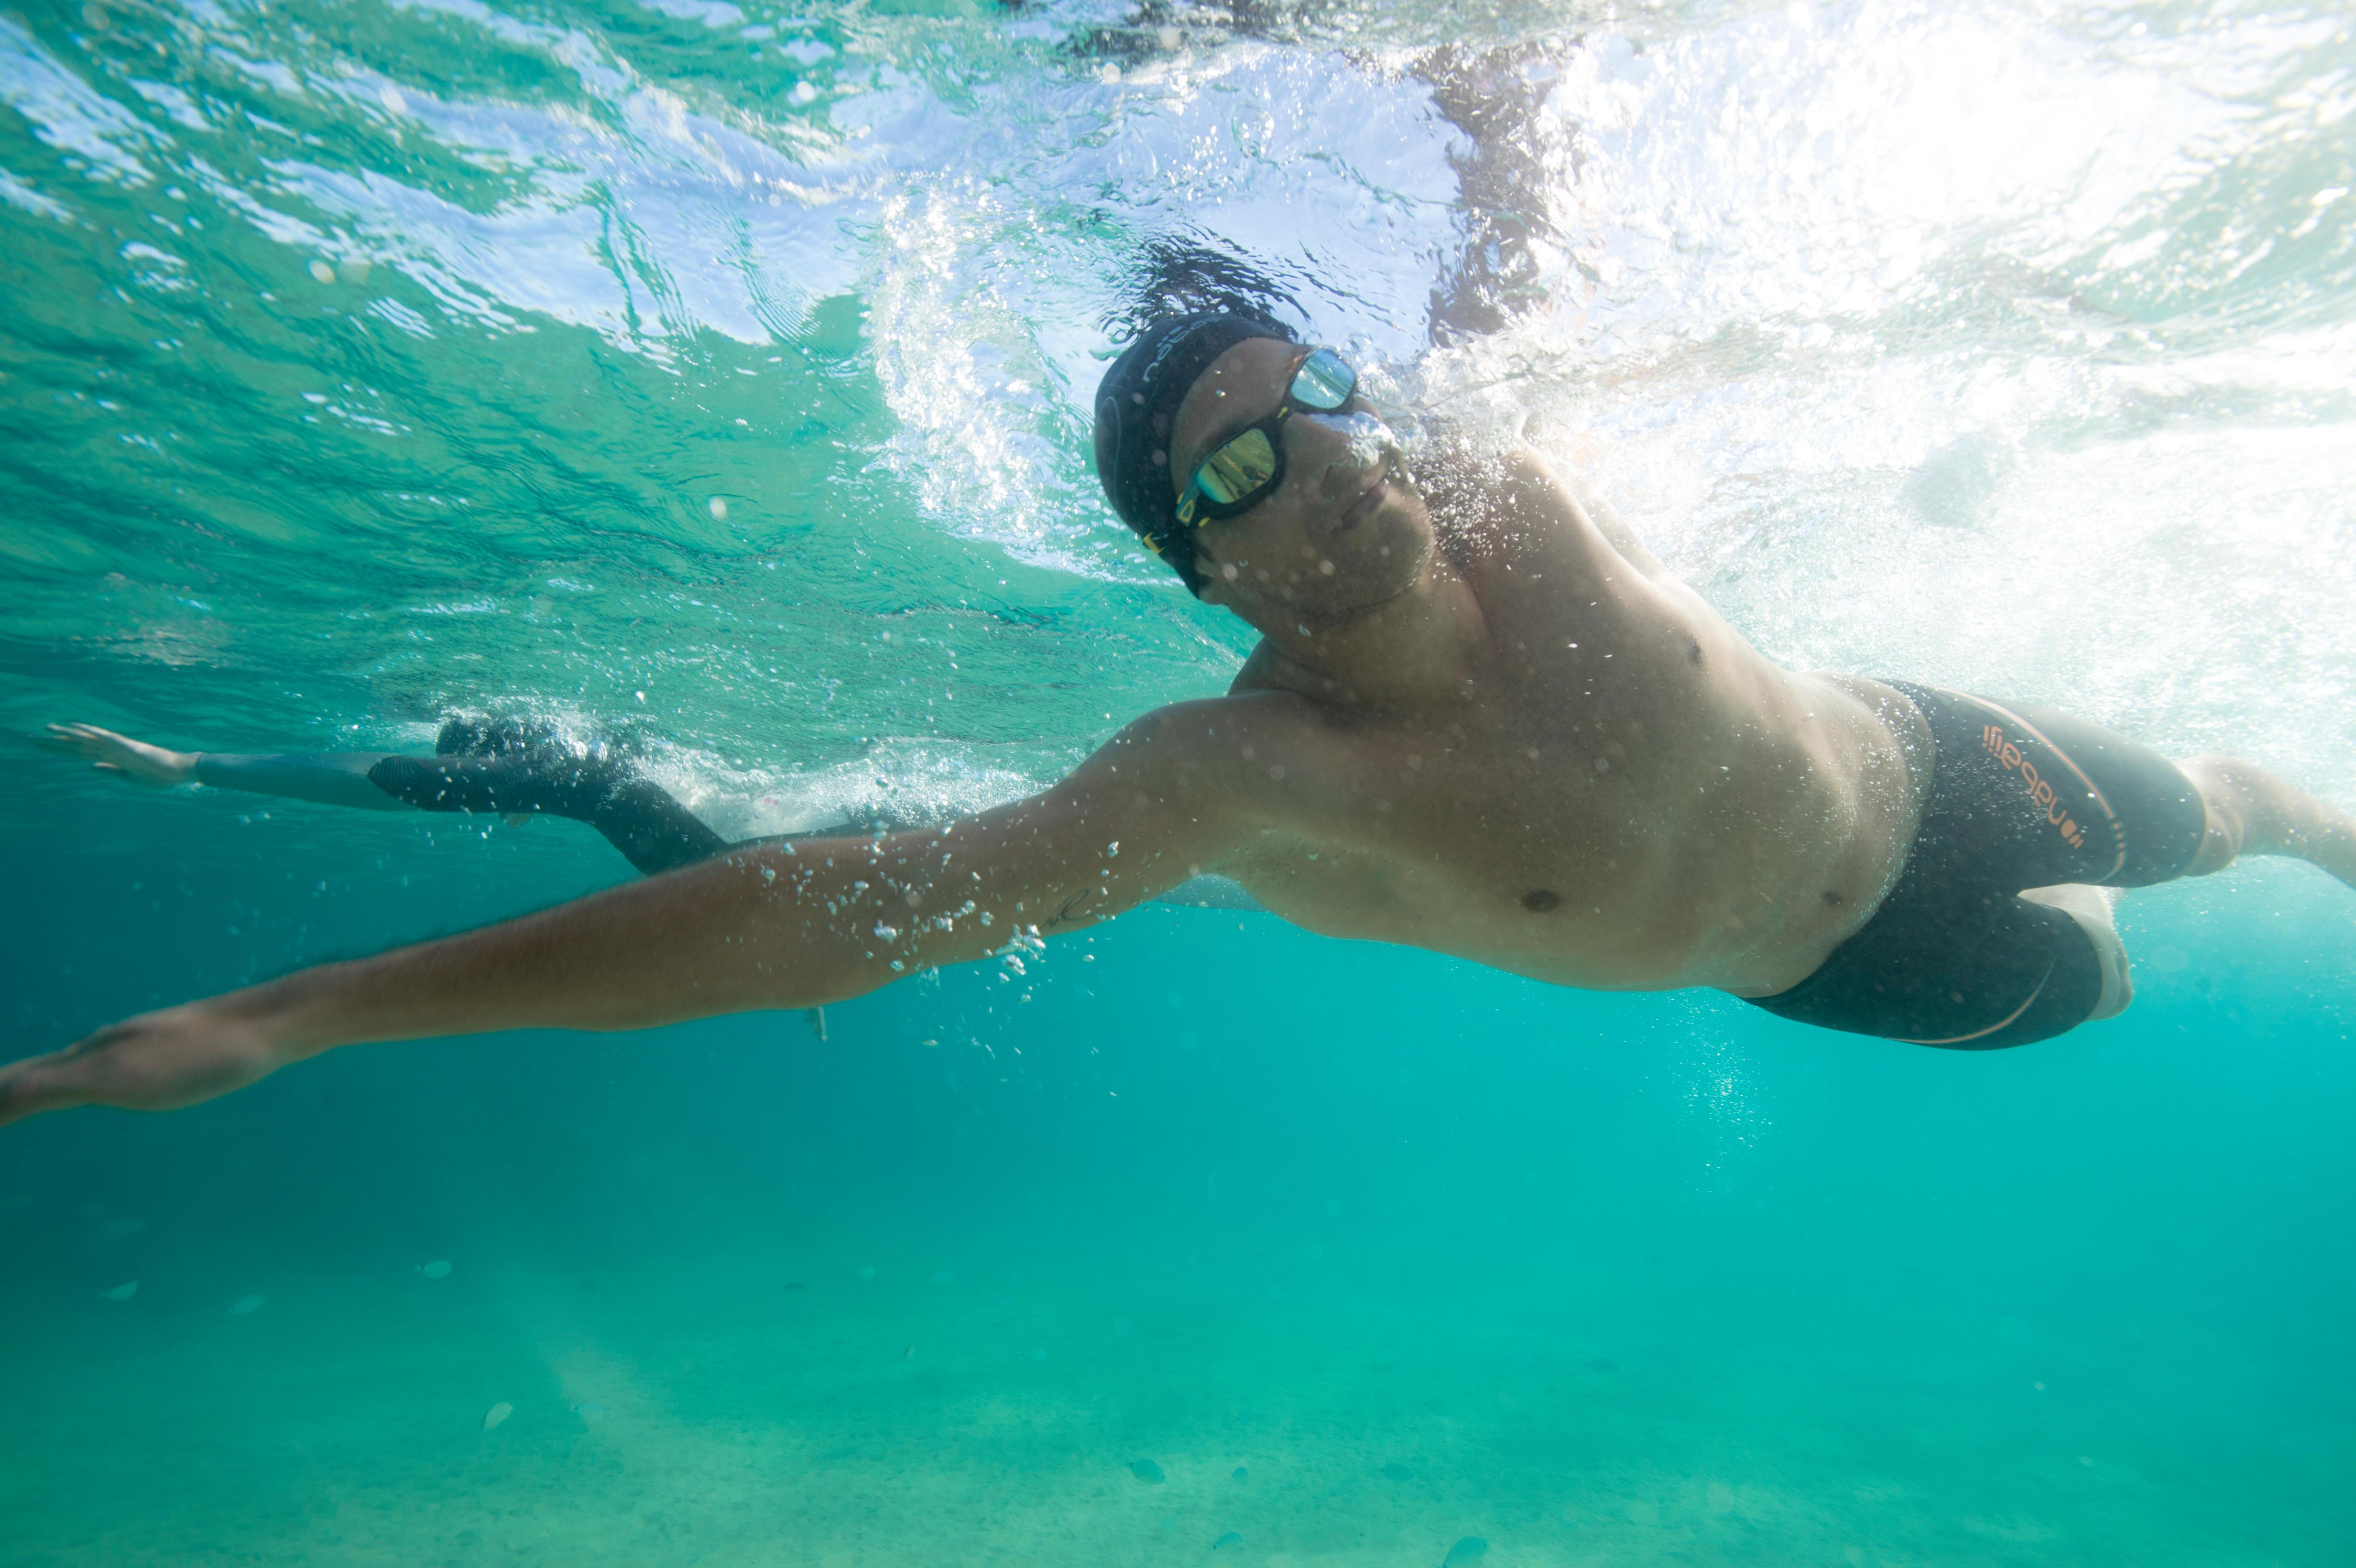 OWS500 4 mm Neoprene Open Water Swimming Jammer